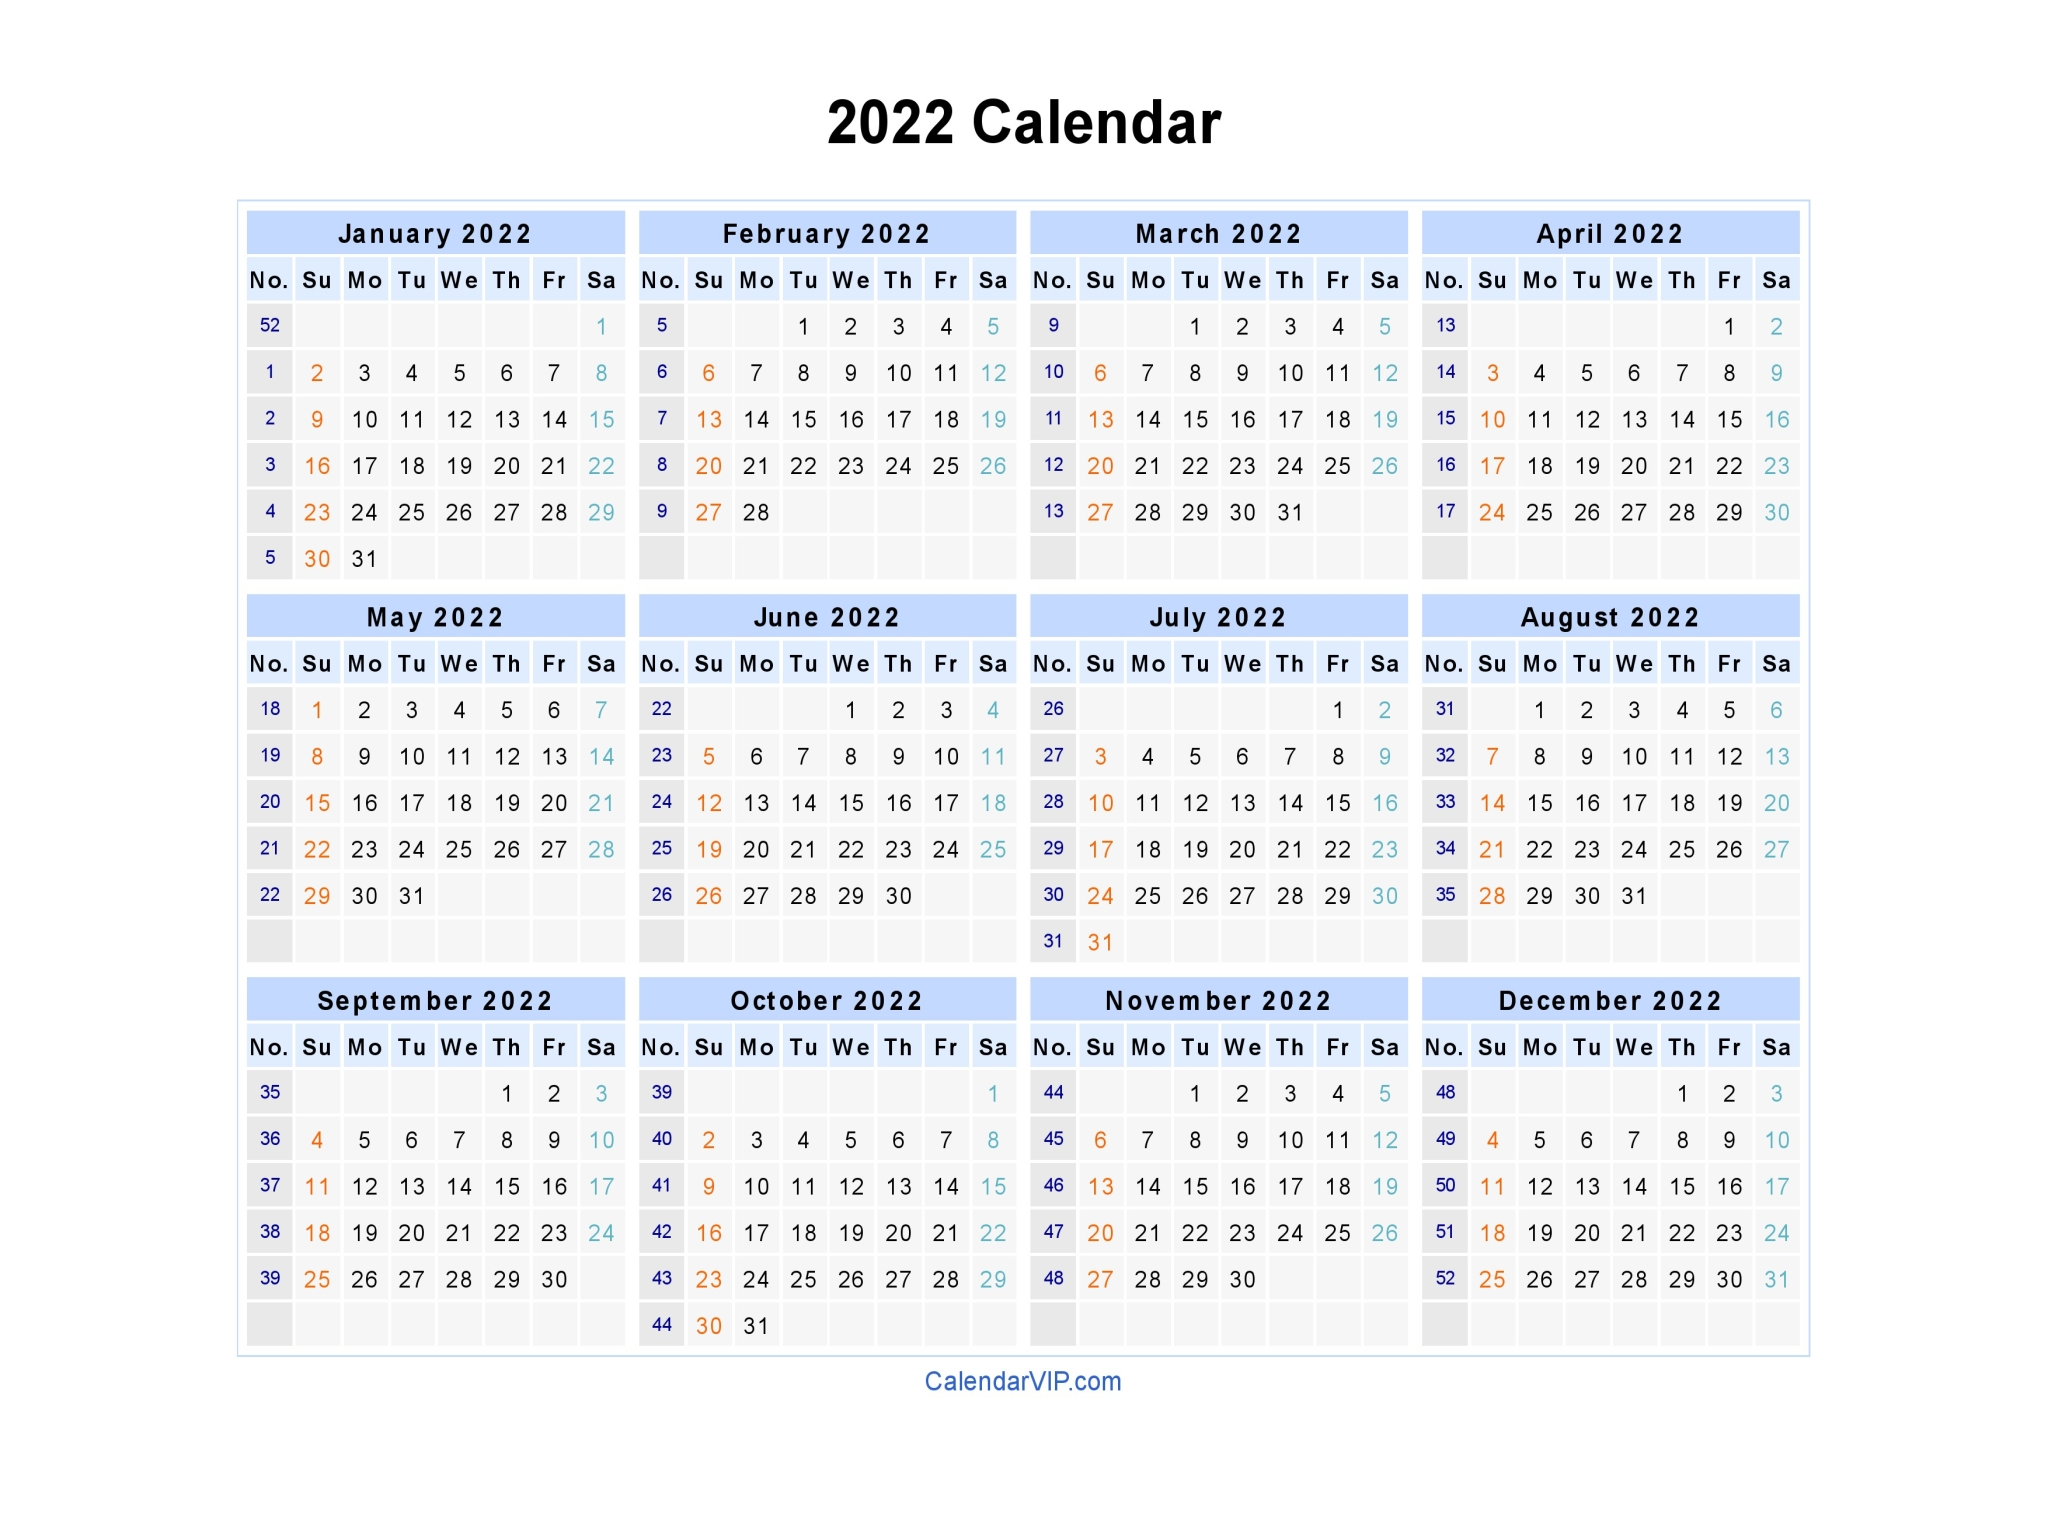 2022 Calendar - Blank Printable Calendar Template in PDF ...